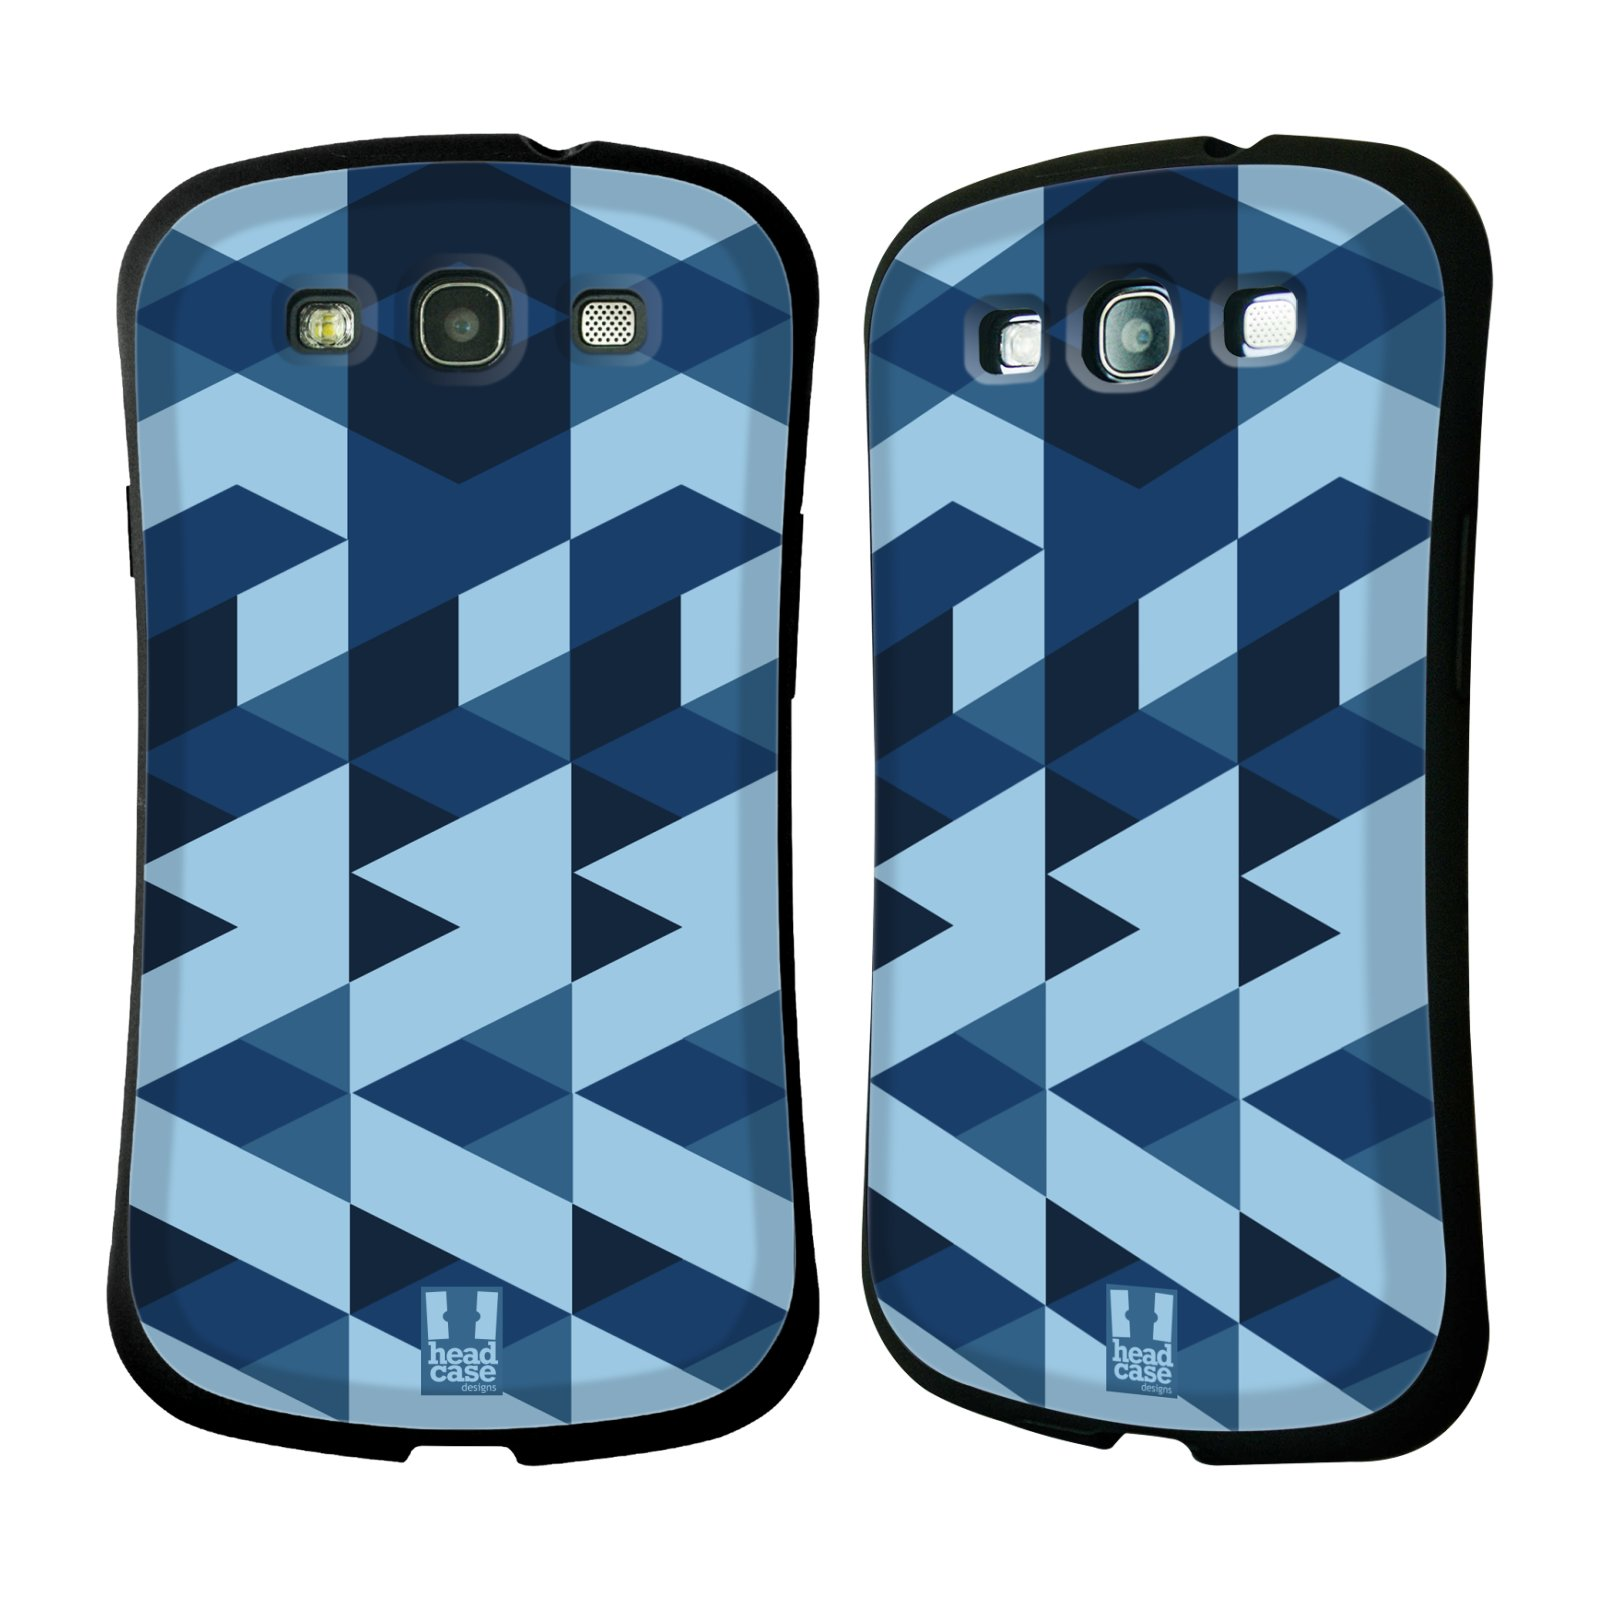 Nárazuvzdorné pouzdro na mobil Samsung Galaxy S3 Neo HEAD CASE GEOMETRIC BLUE (Odolný nárazuvzdorný silikonový kryt či obal na mobilní telefon Samsung Galaxy S3 Neo GT-i9301i)